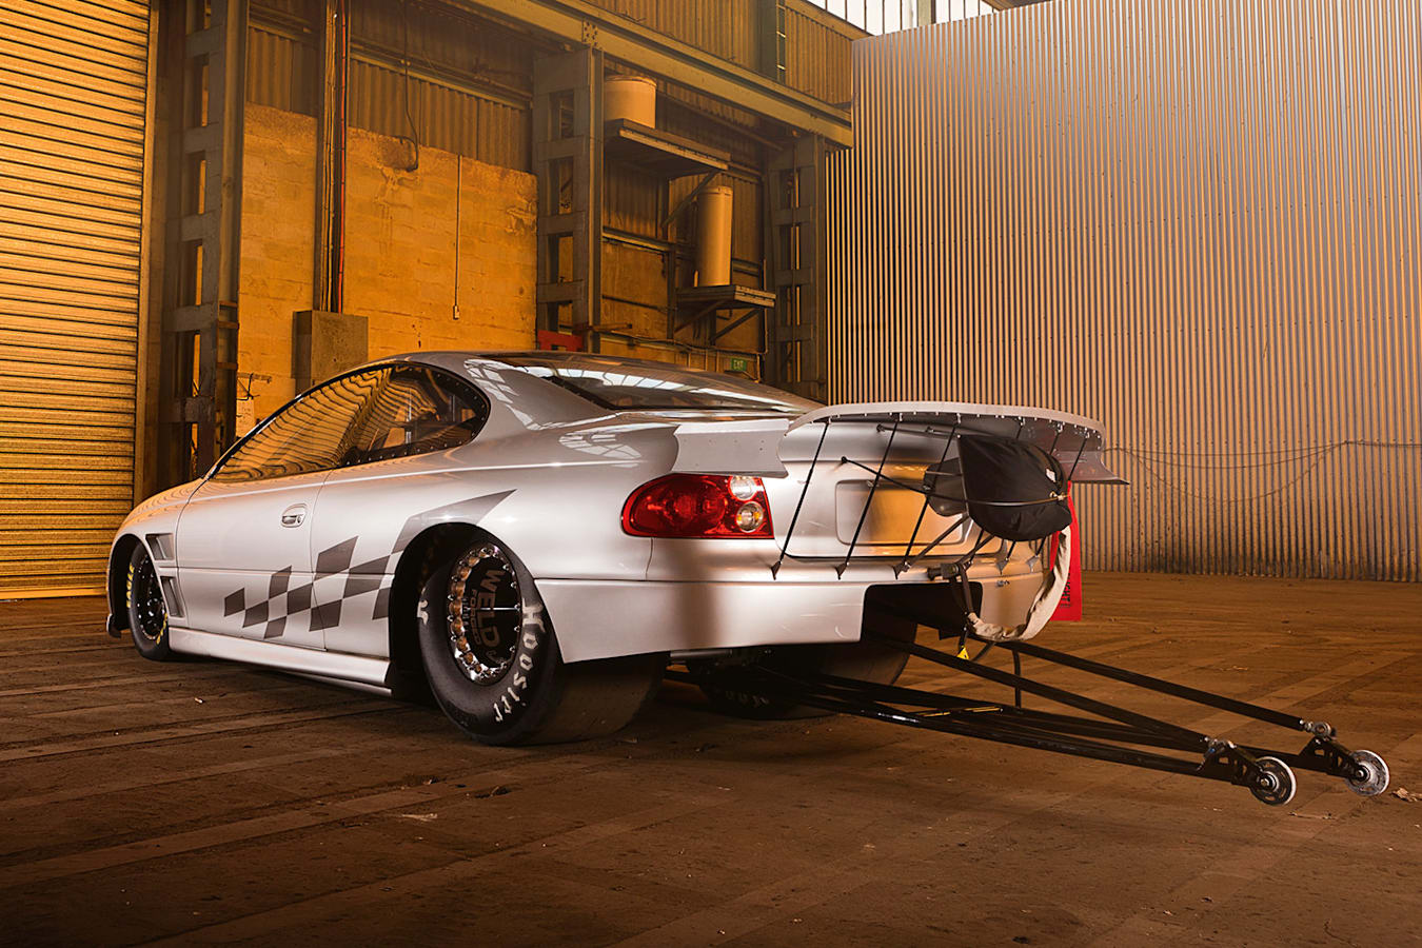 Pontiac GTO rear